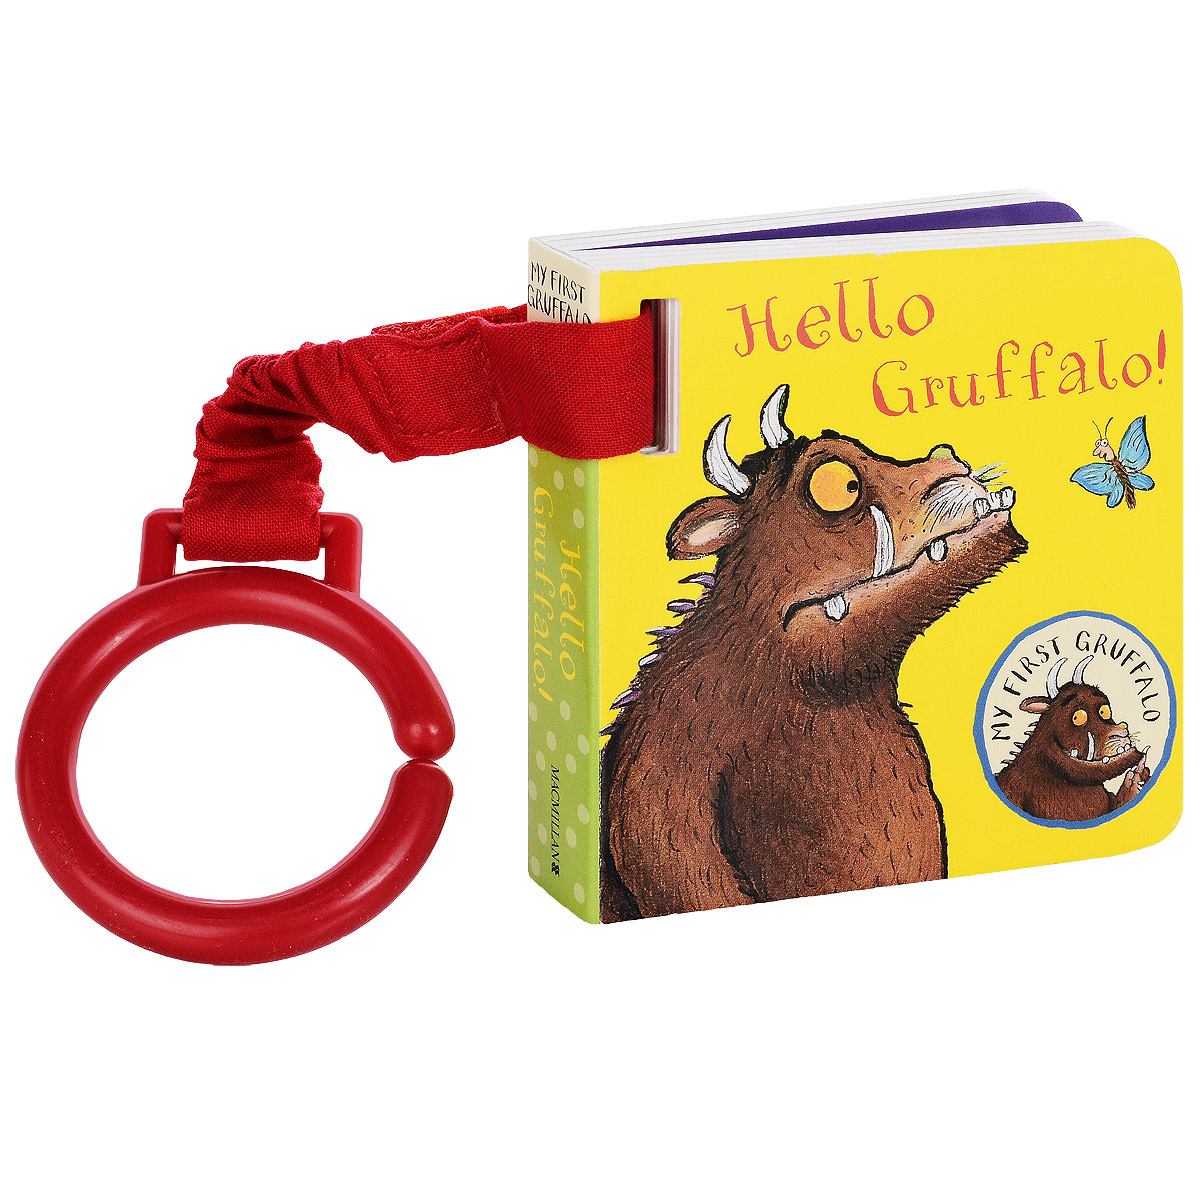 Hello Gruffalo! гусарова н ред суперраскраска герои любимых мультфильмов